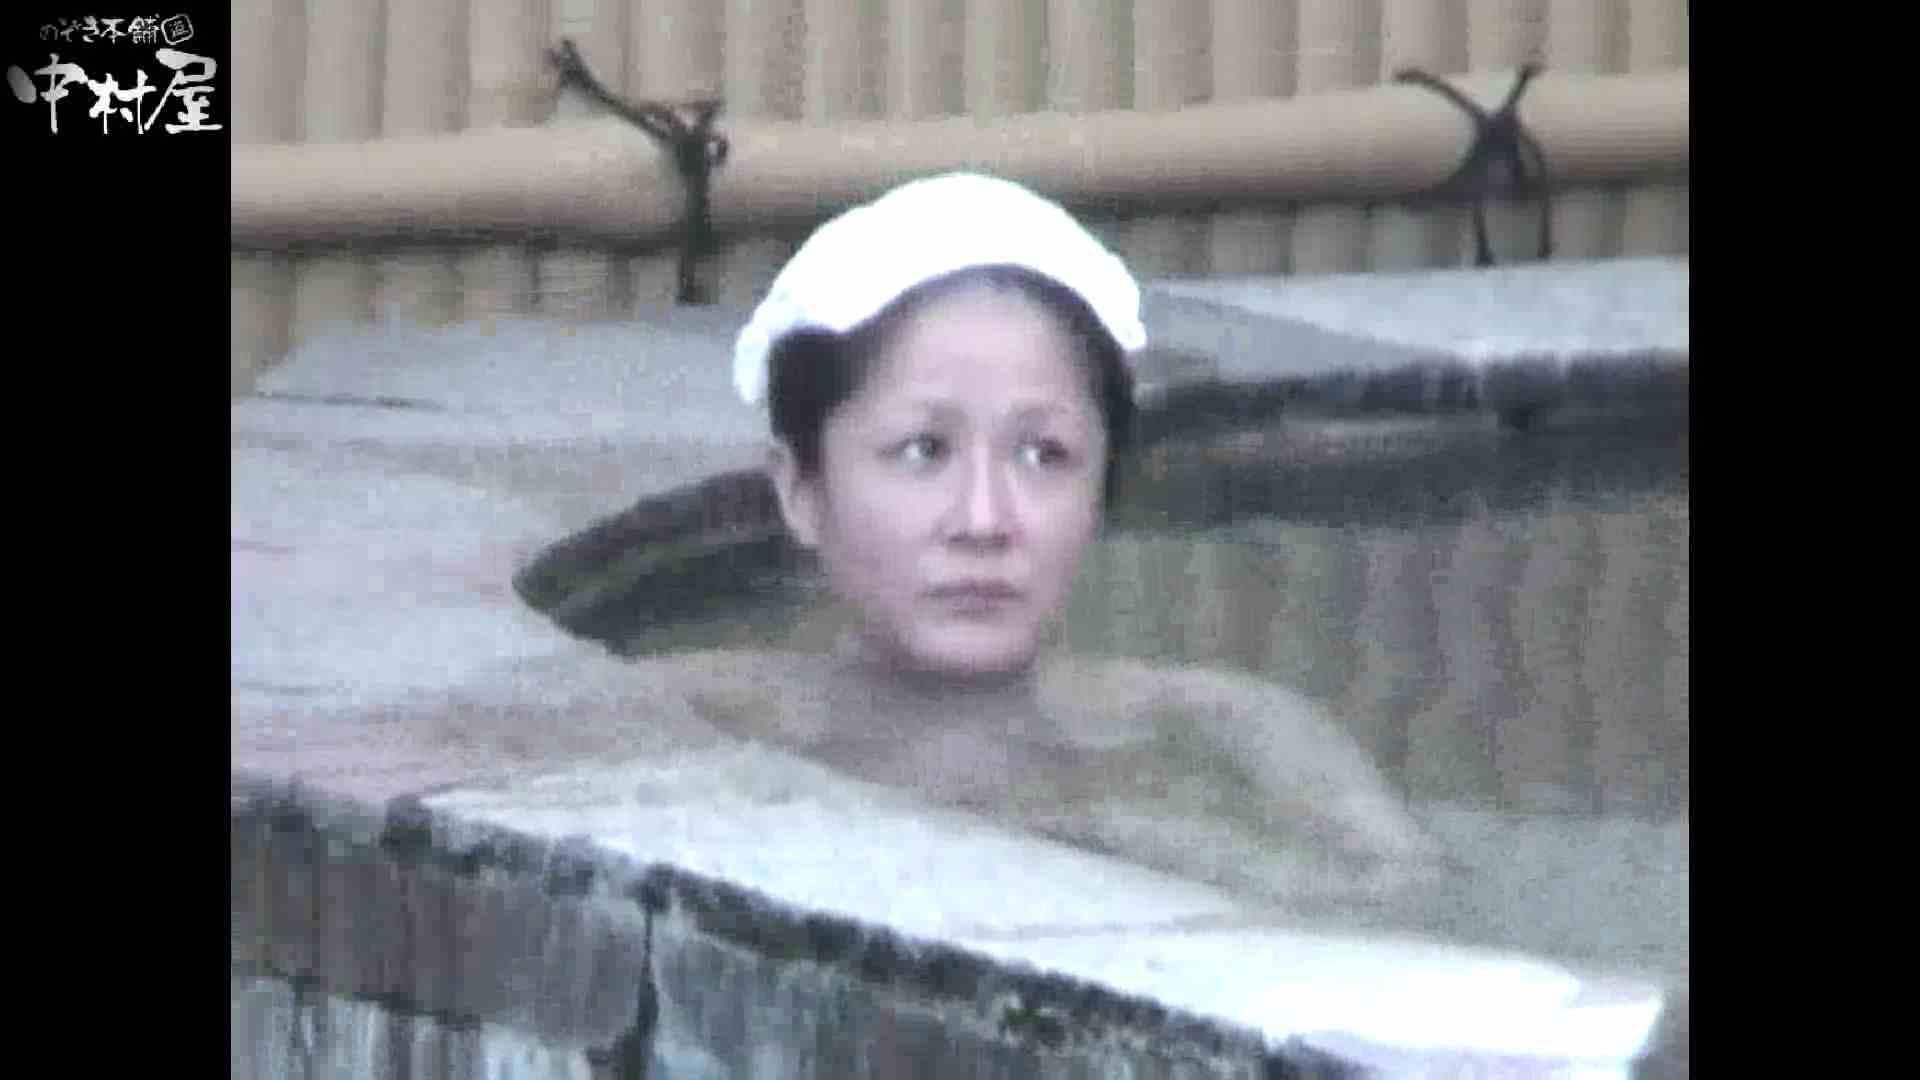 Aquaな露天風呂Vol.880潜入盗撮露天風呂十六判湯 其の六 露天 | 潜入シリーズ  95pic 64